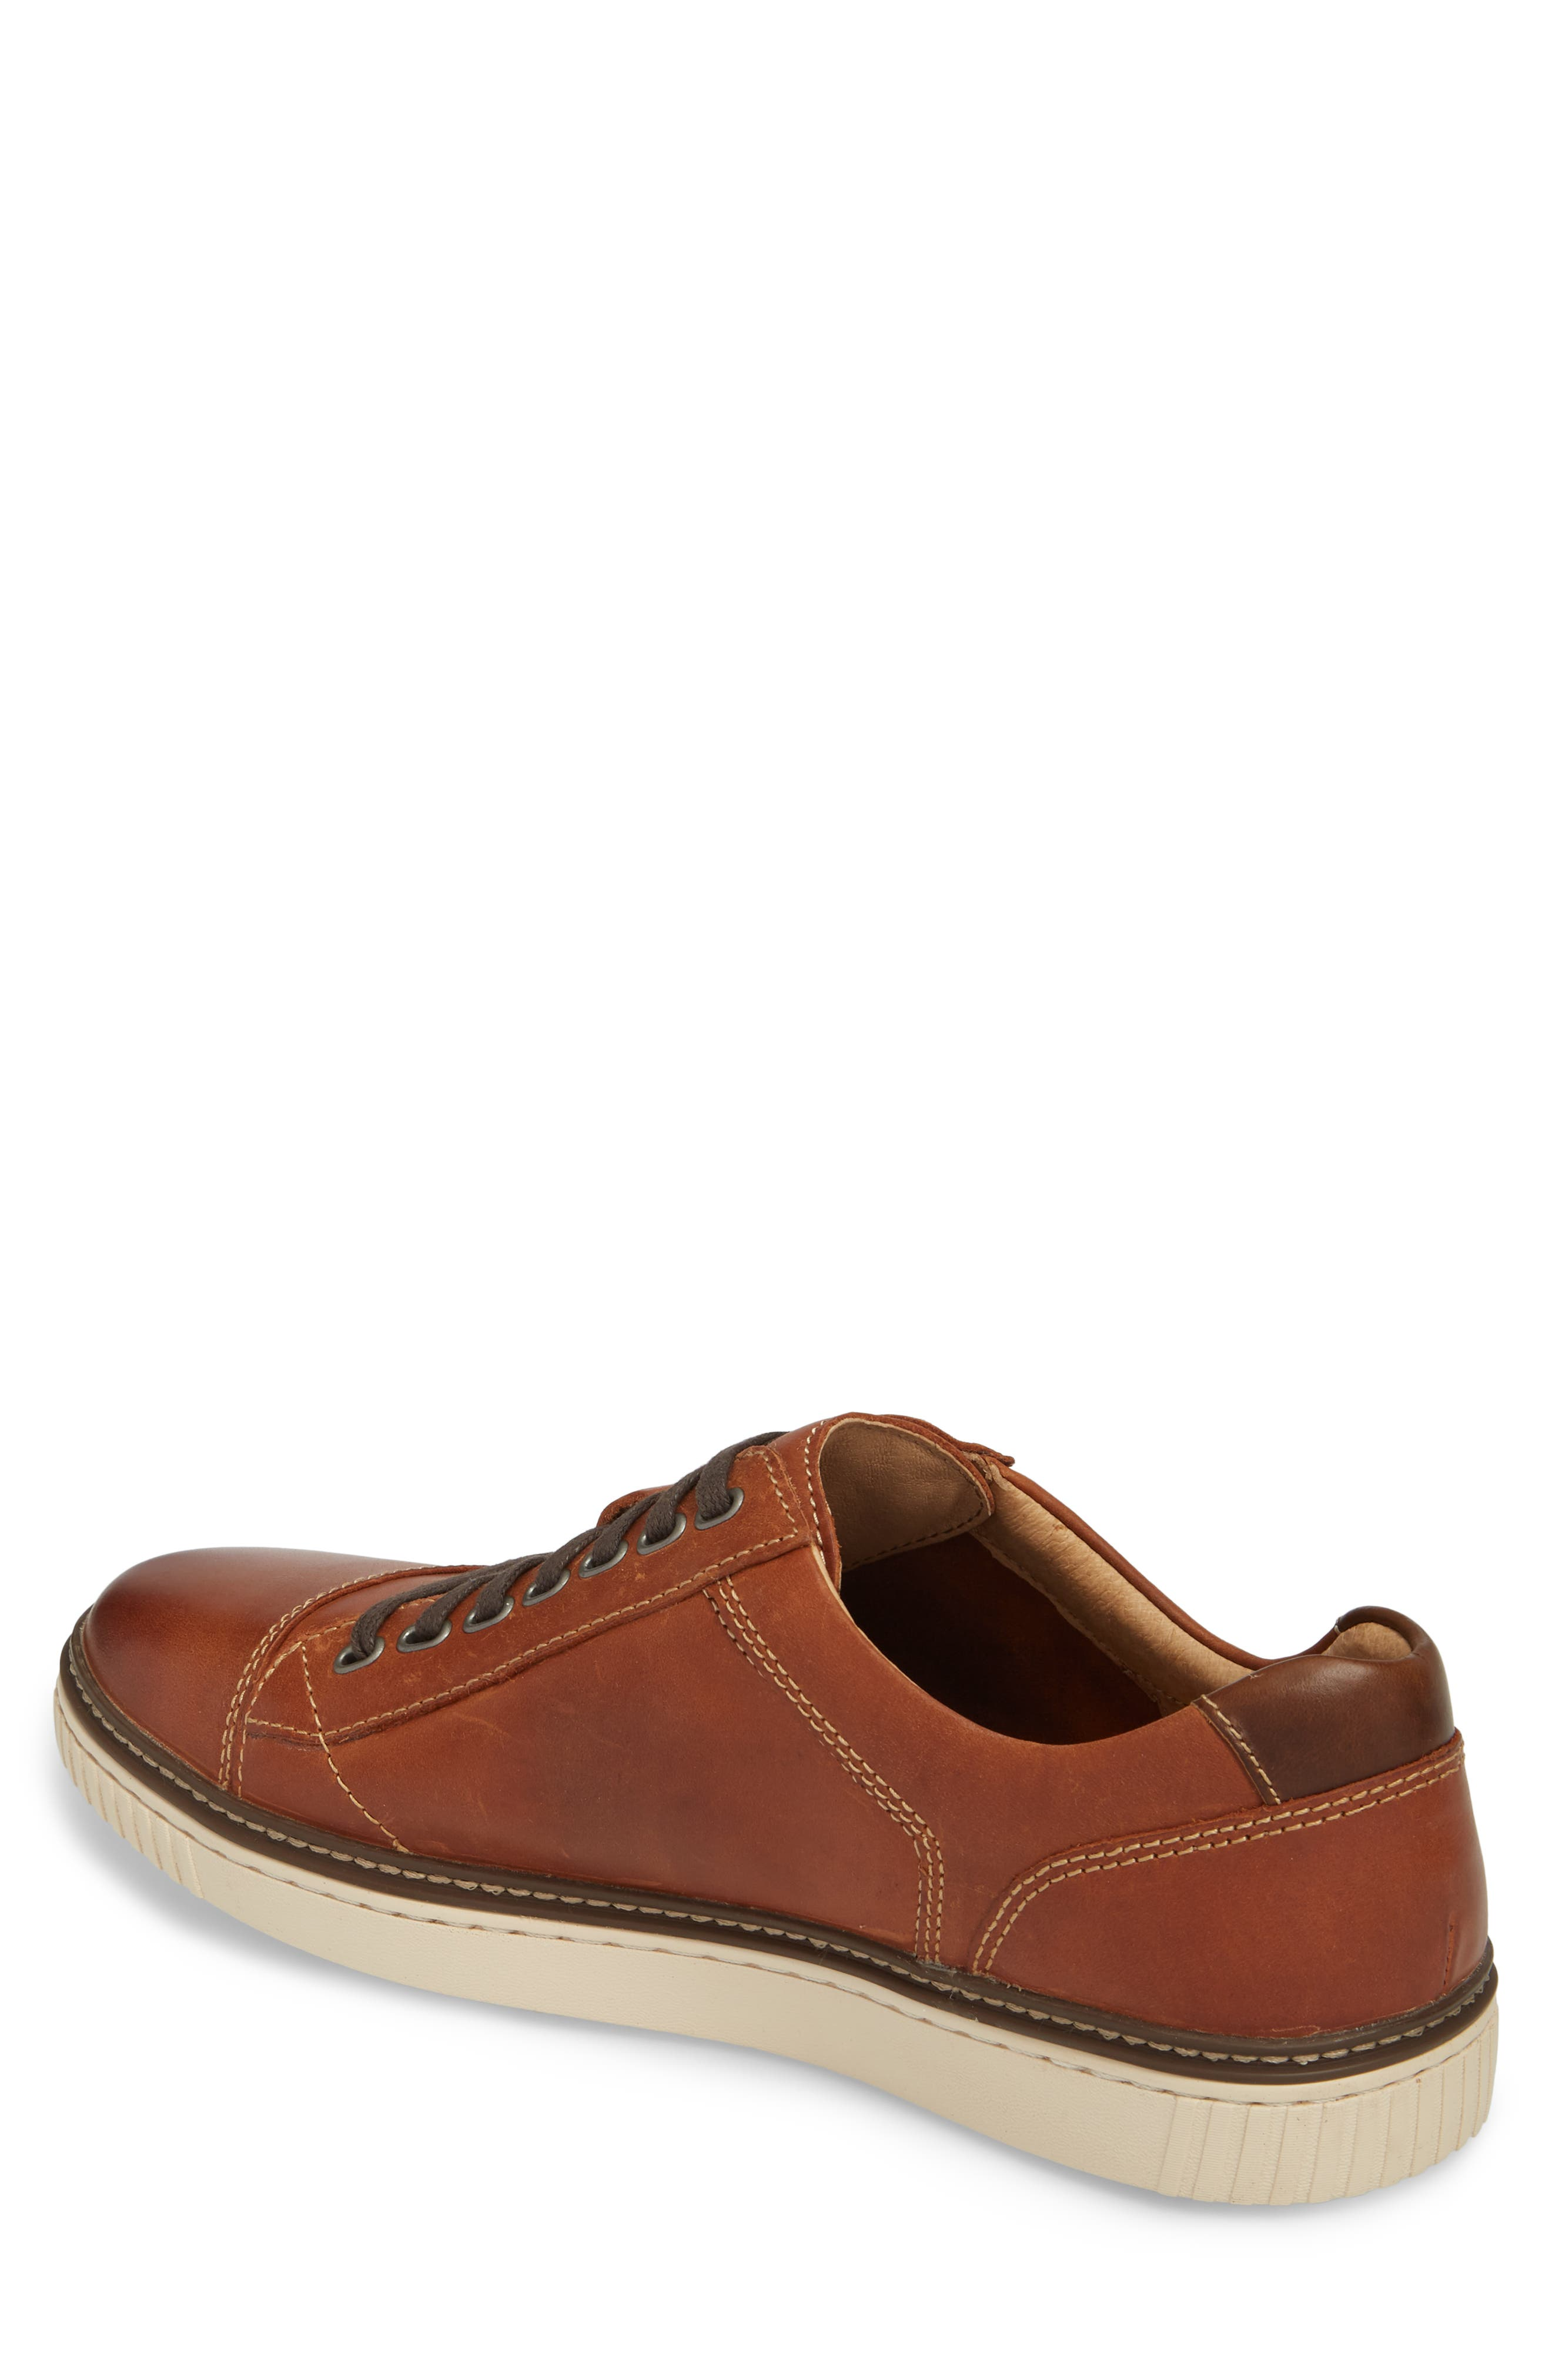 Wallace Low Top Sneaker,                             Alternate thumbnail 2, color,                             Tan Nubuck